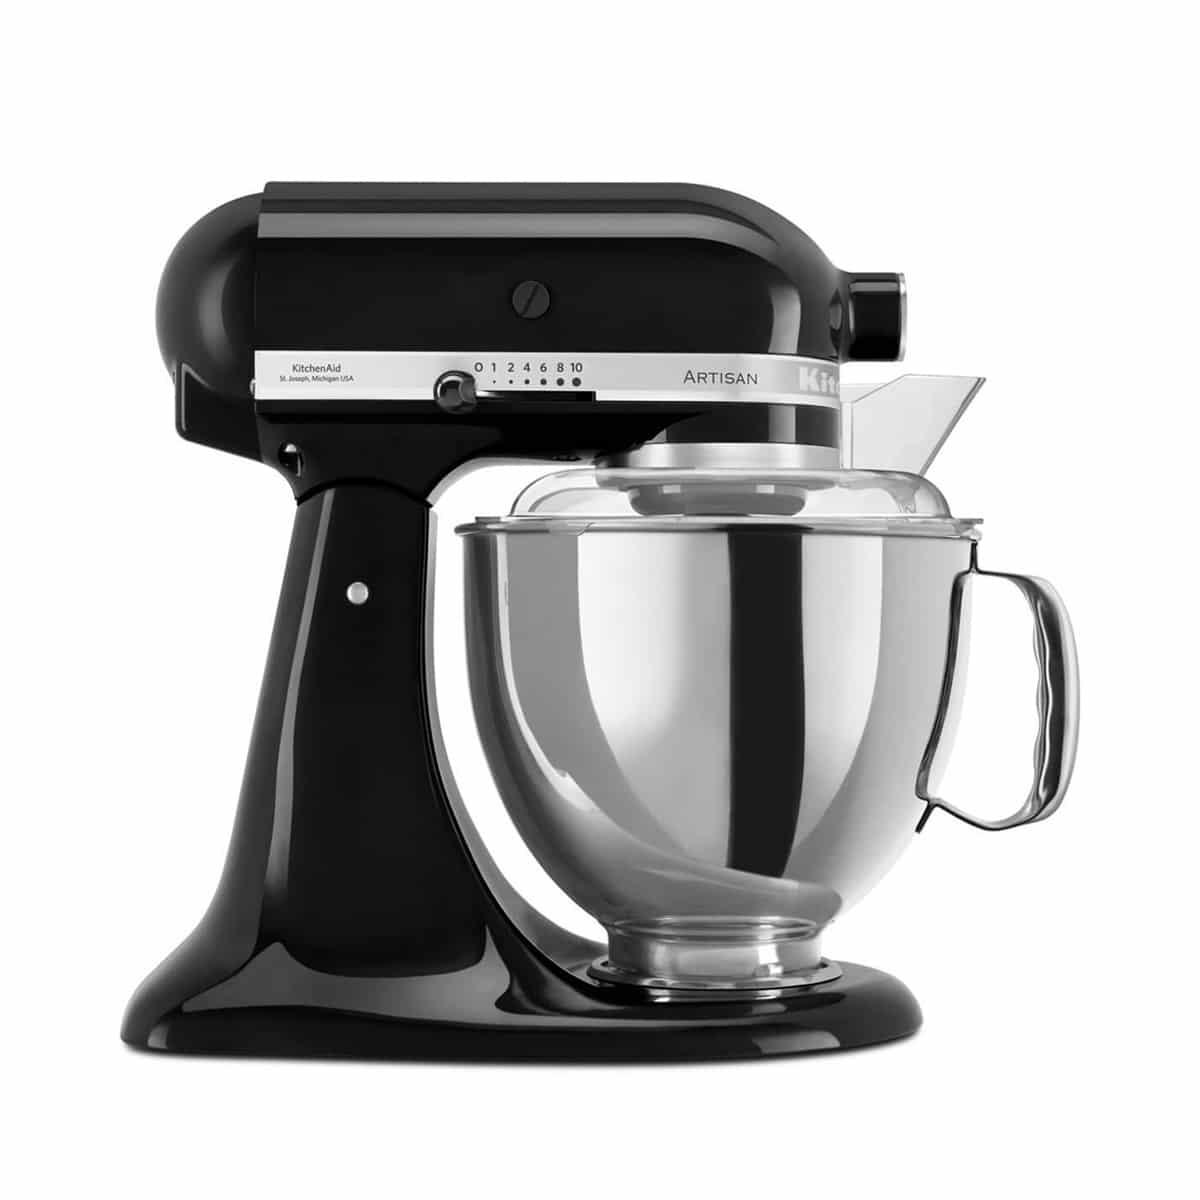 KitchenAid samostojeći mikser Artisan (4,8 l) – 5KSM175PS - Onyx Black